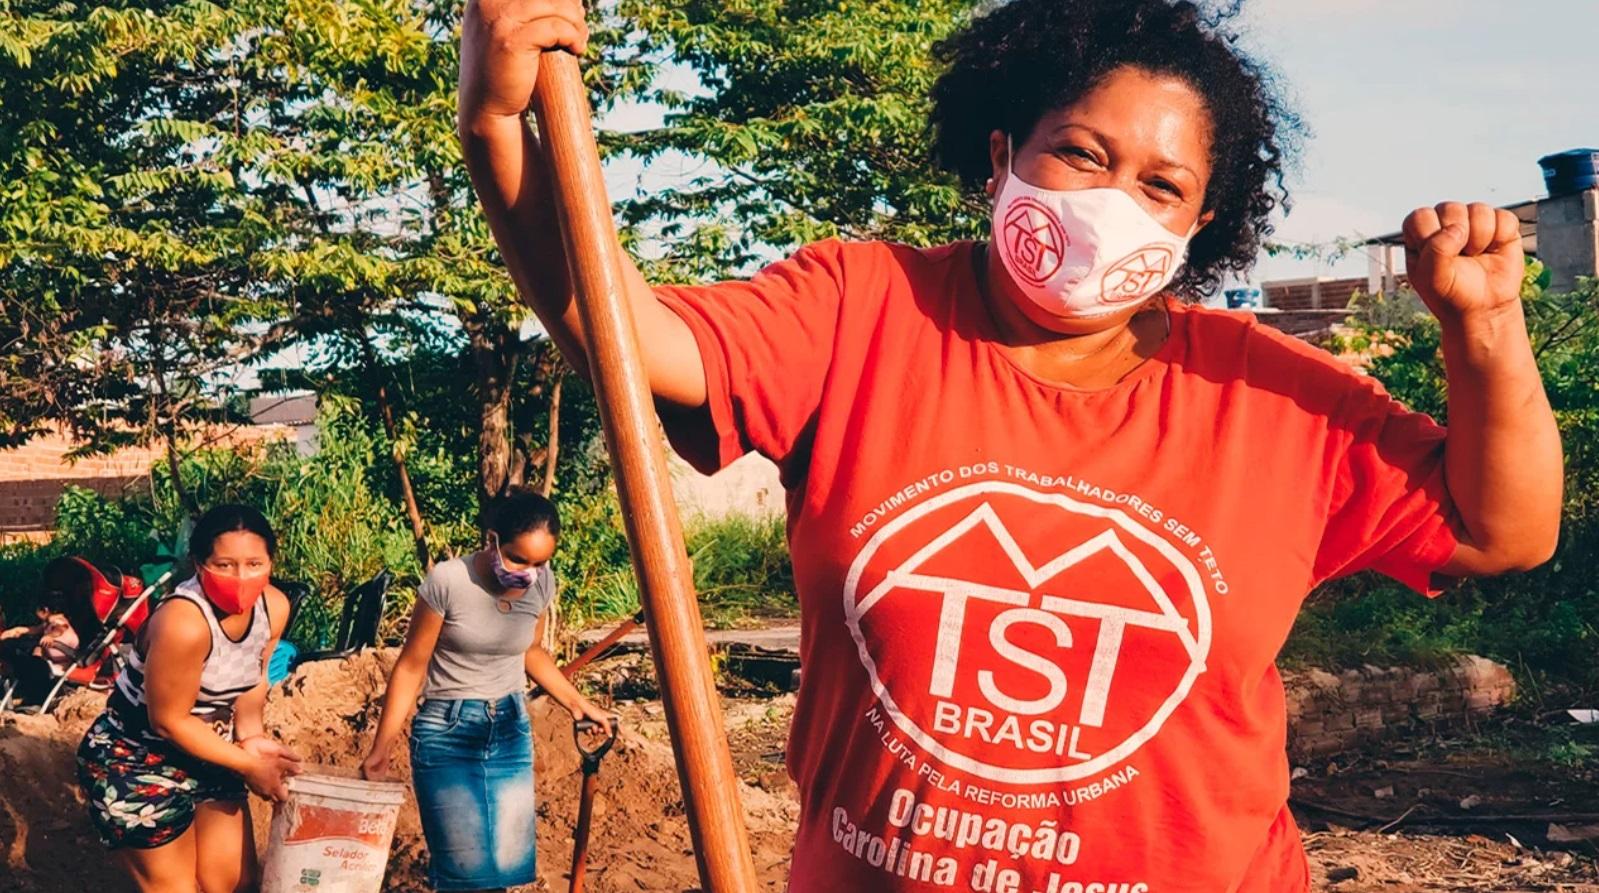 Trincheiras de resistência e redes de solidariedade na pandemia no Brasil